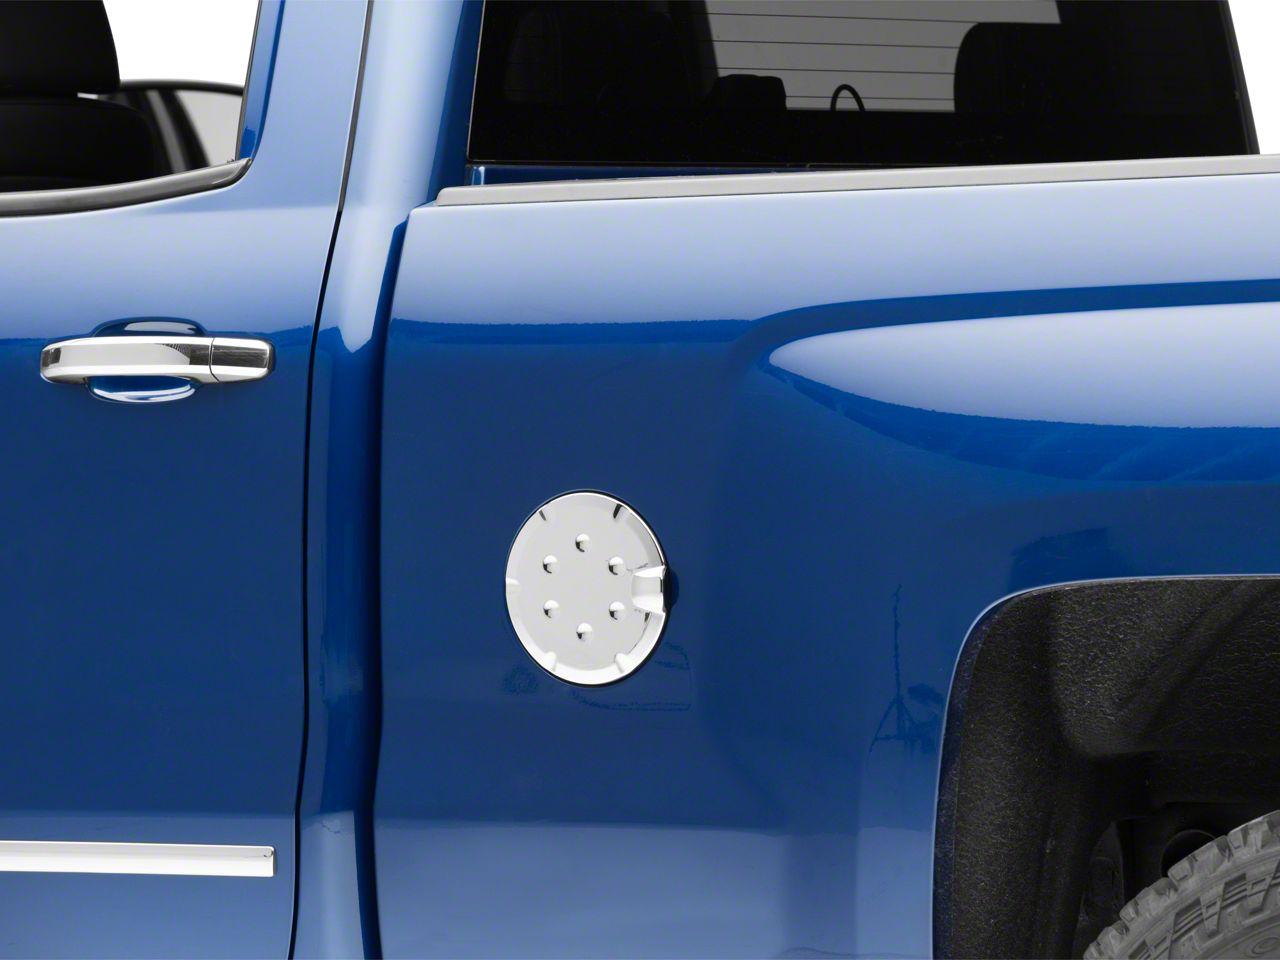 Putco Fuel Tank Door Cover - Chrome (14-18 Silverado 1500)